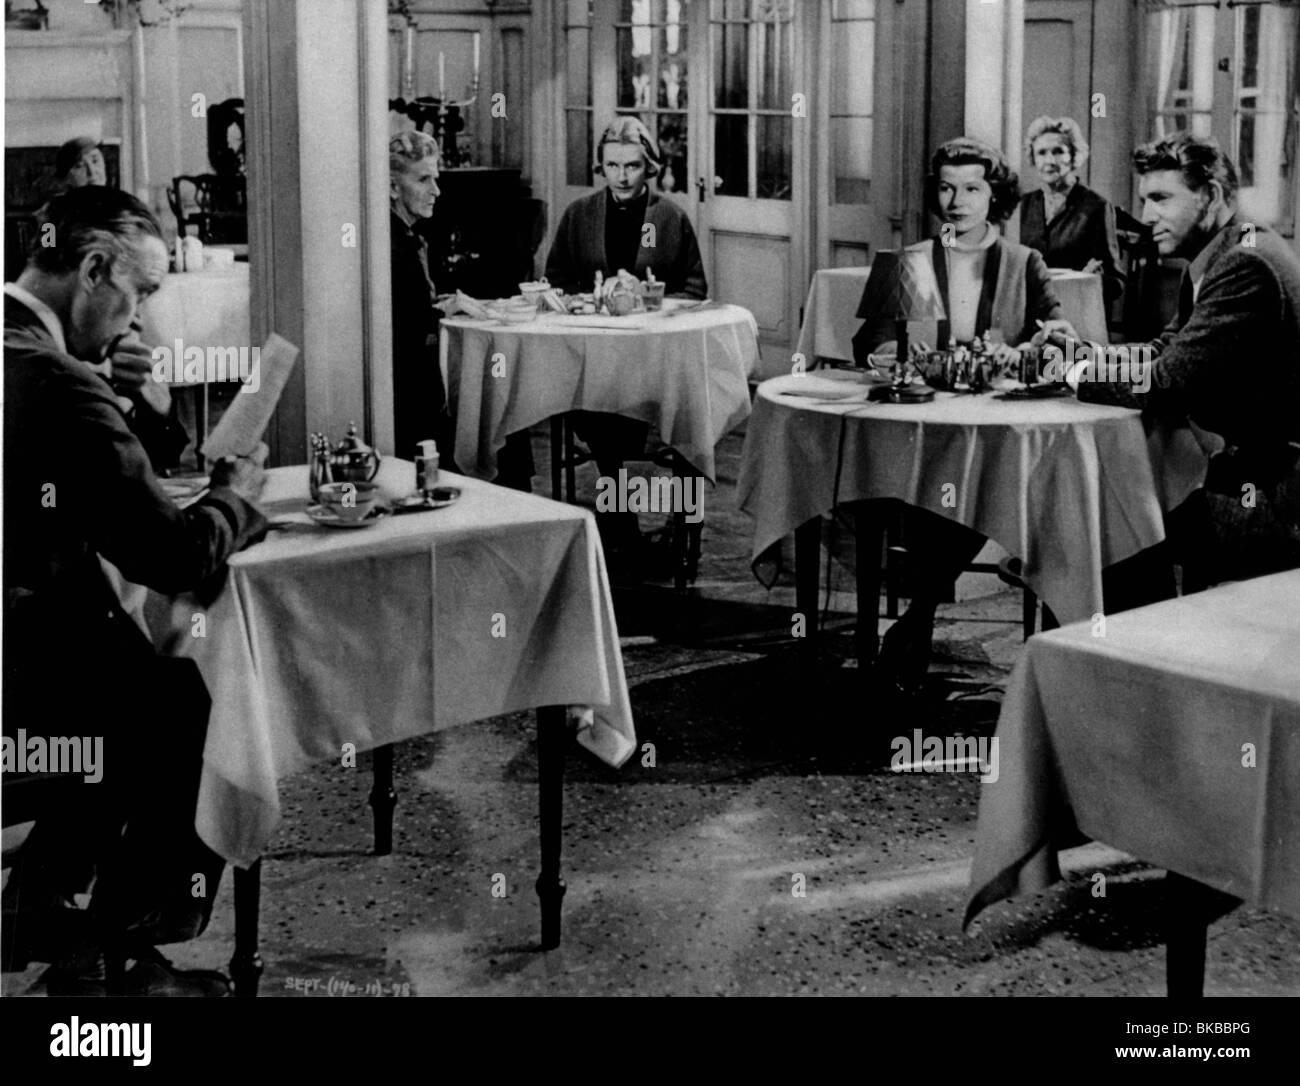 SEPARATE TABLES DAVID NIVEN,GLADYS COOPER,DEBORAH KERR,RITA HAYWORTH,CATHLEEN NESBITT,BURT LANCASTER - Stock Image